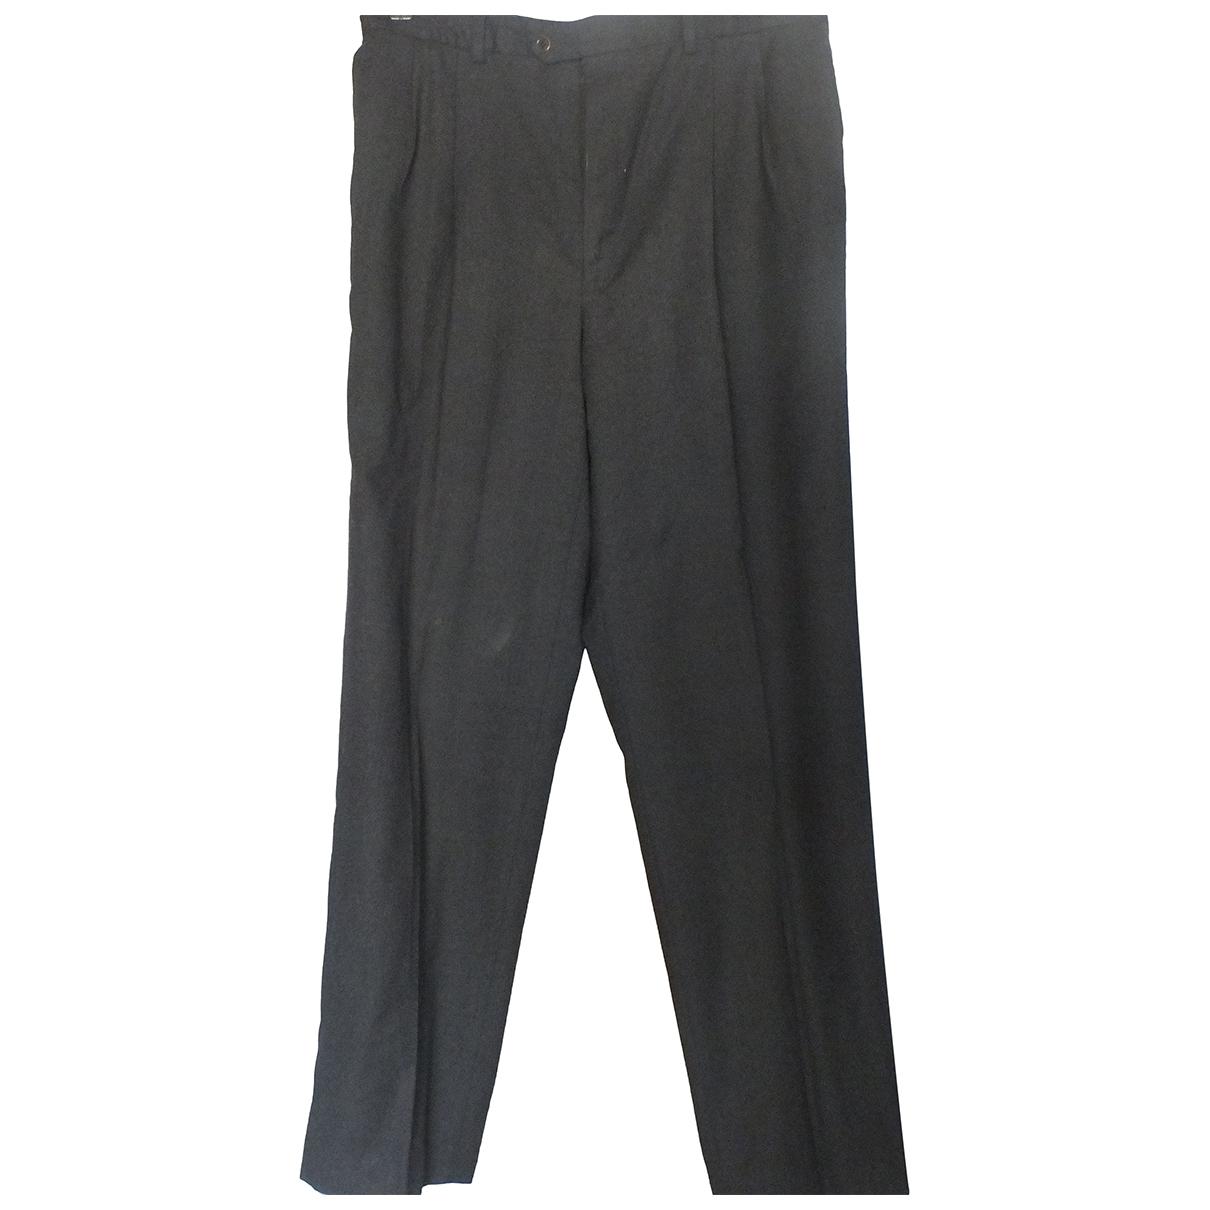 Valentino Garavani \N Anthracite Wool Trousers for Men 54 IT